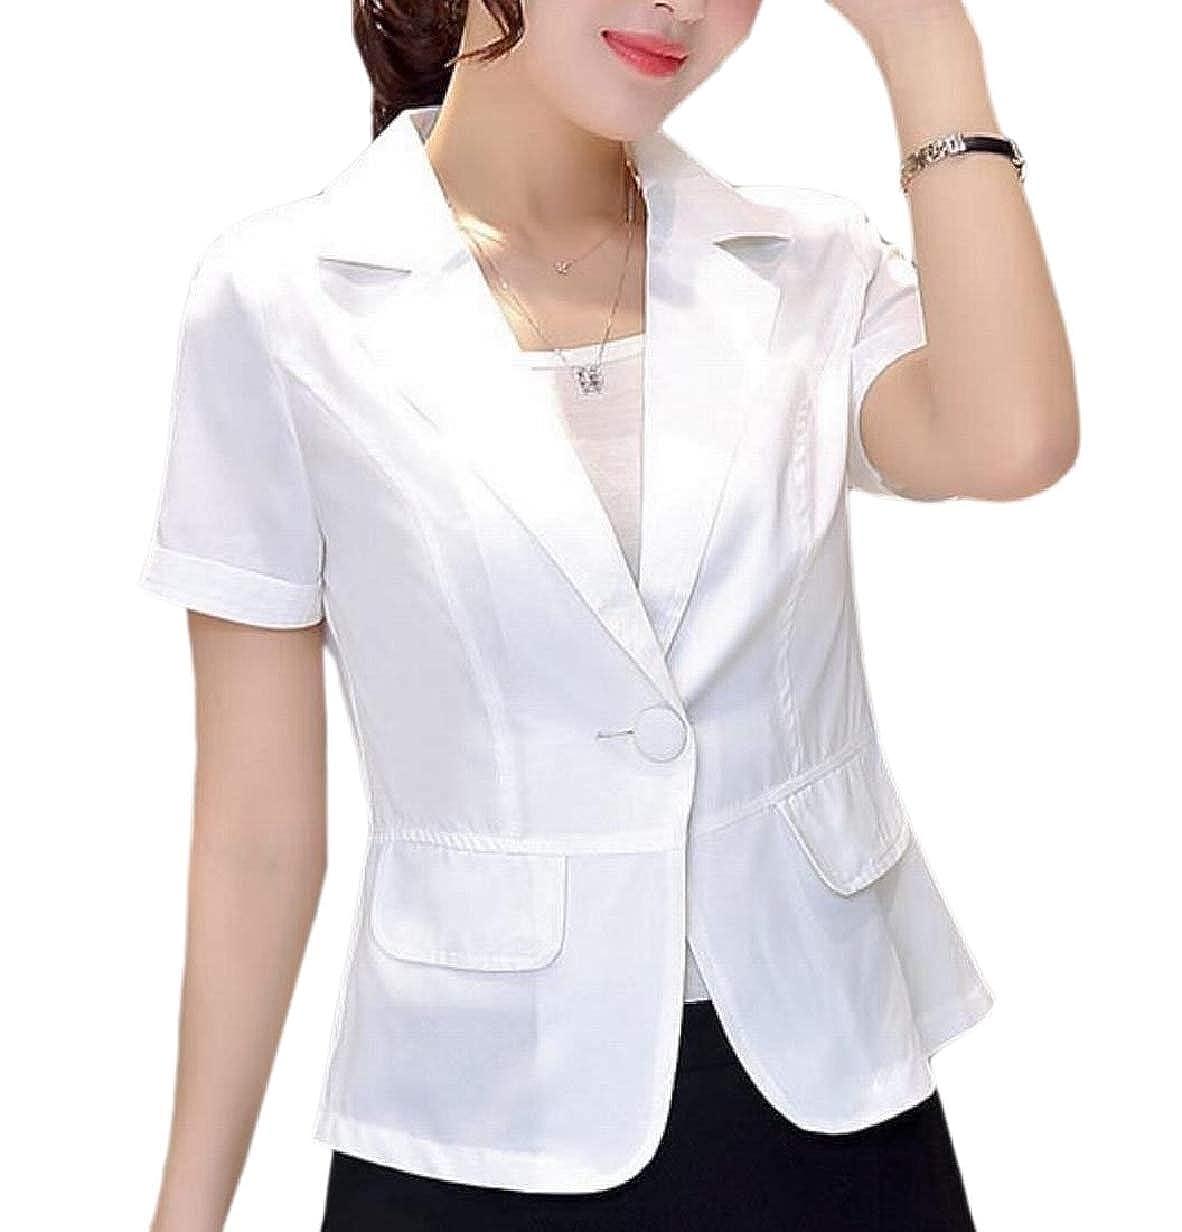 CBTLVSN Women One Button Business Short Sleeve Work OL Blazer Suit Jackets